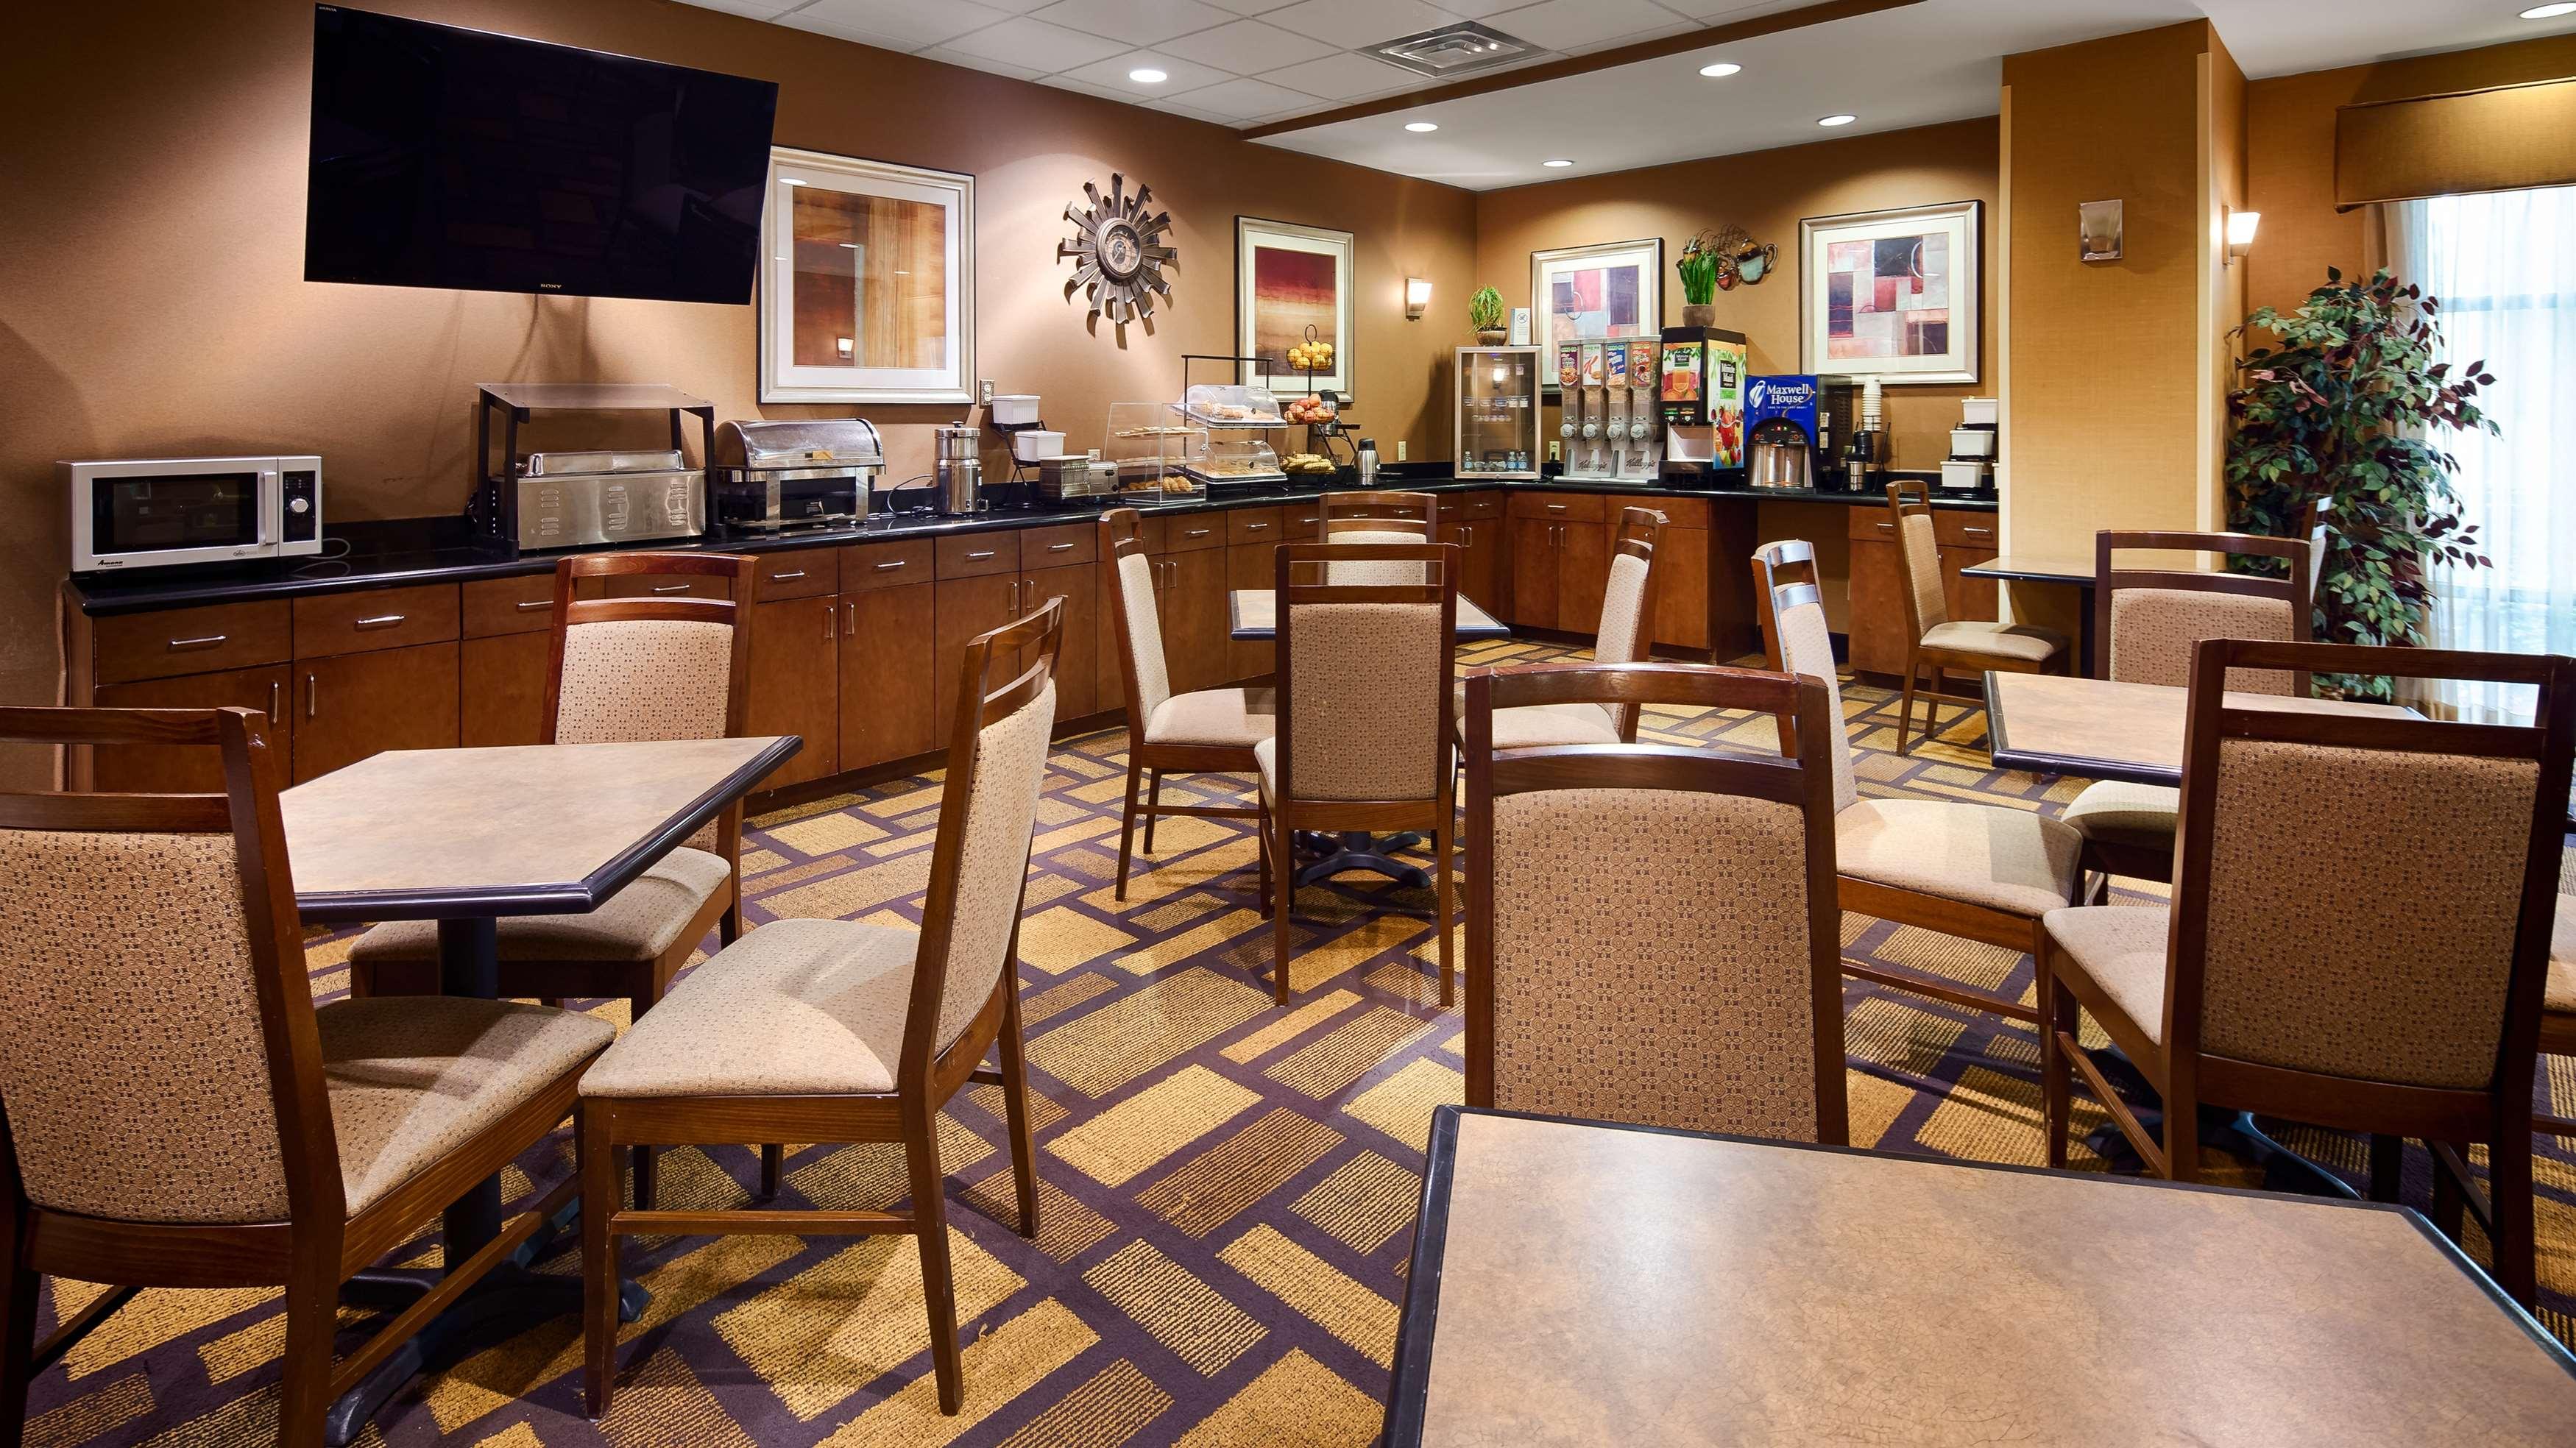 Best Western St. Francisville Hotel image 17